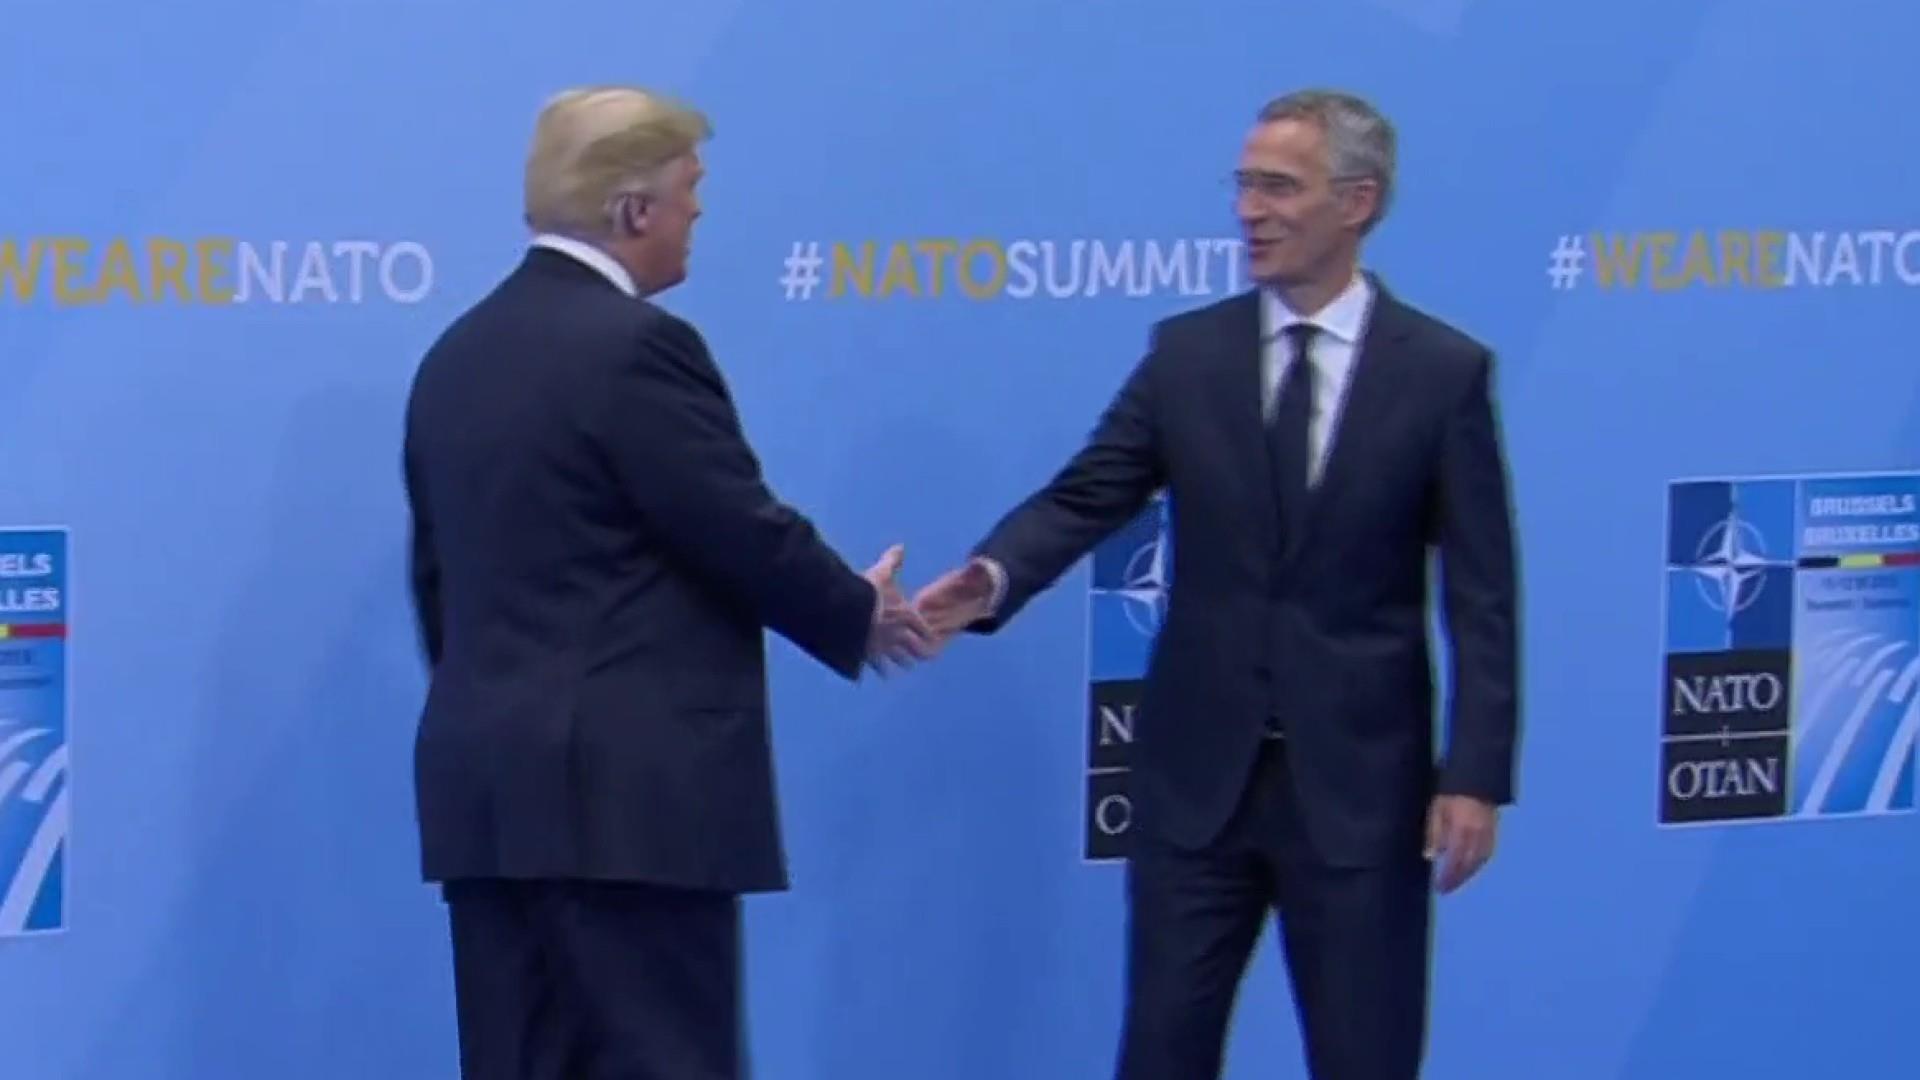 President Trump points fingers at NATO over defense spending